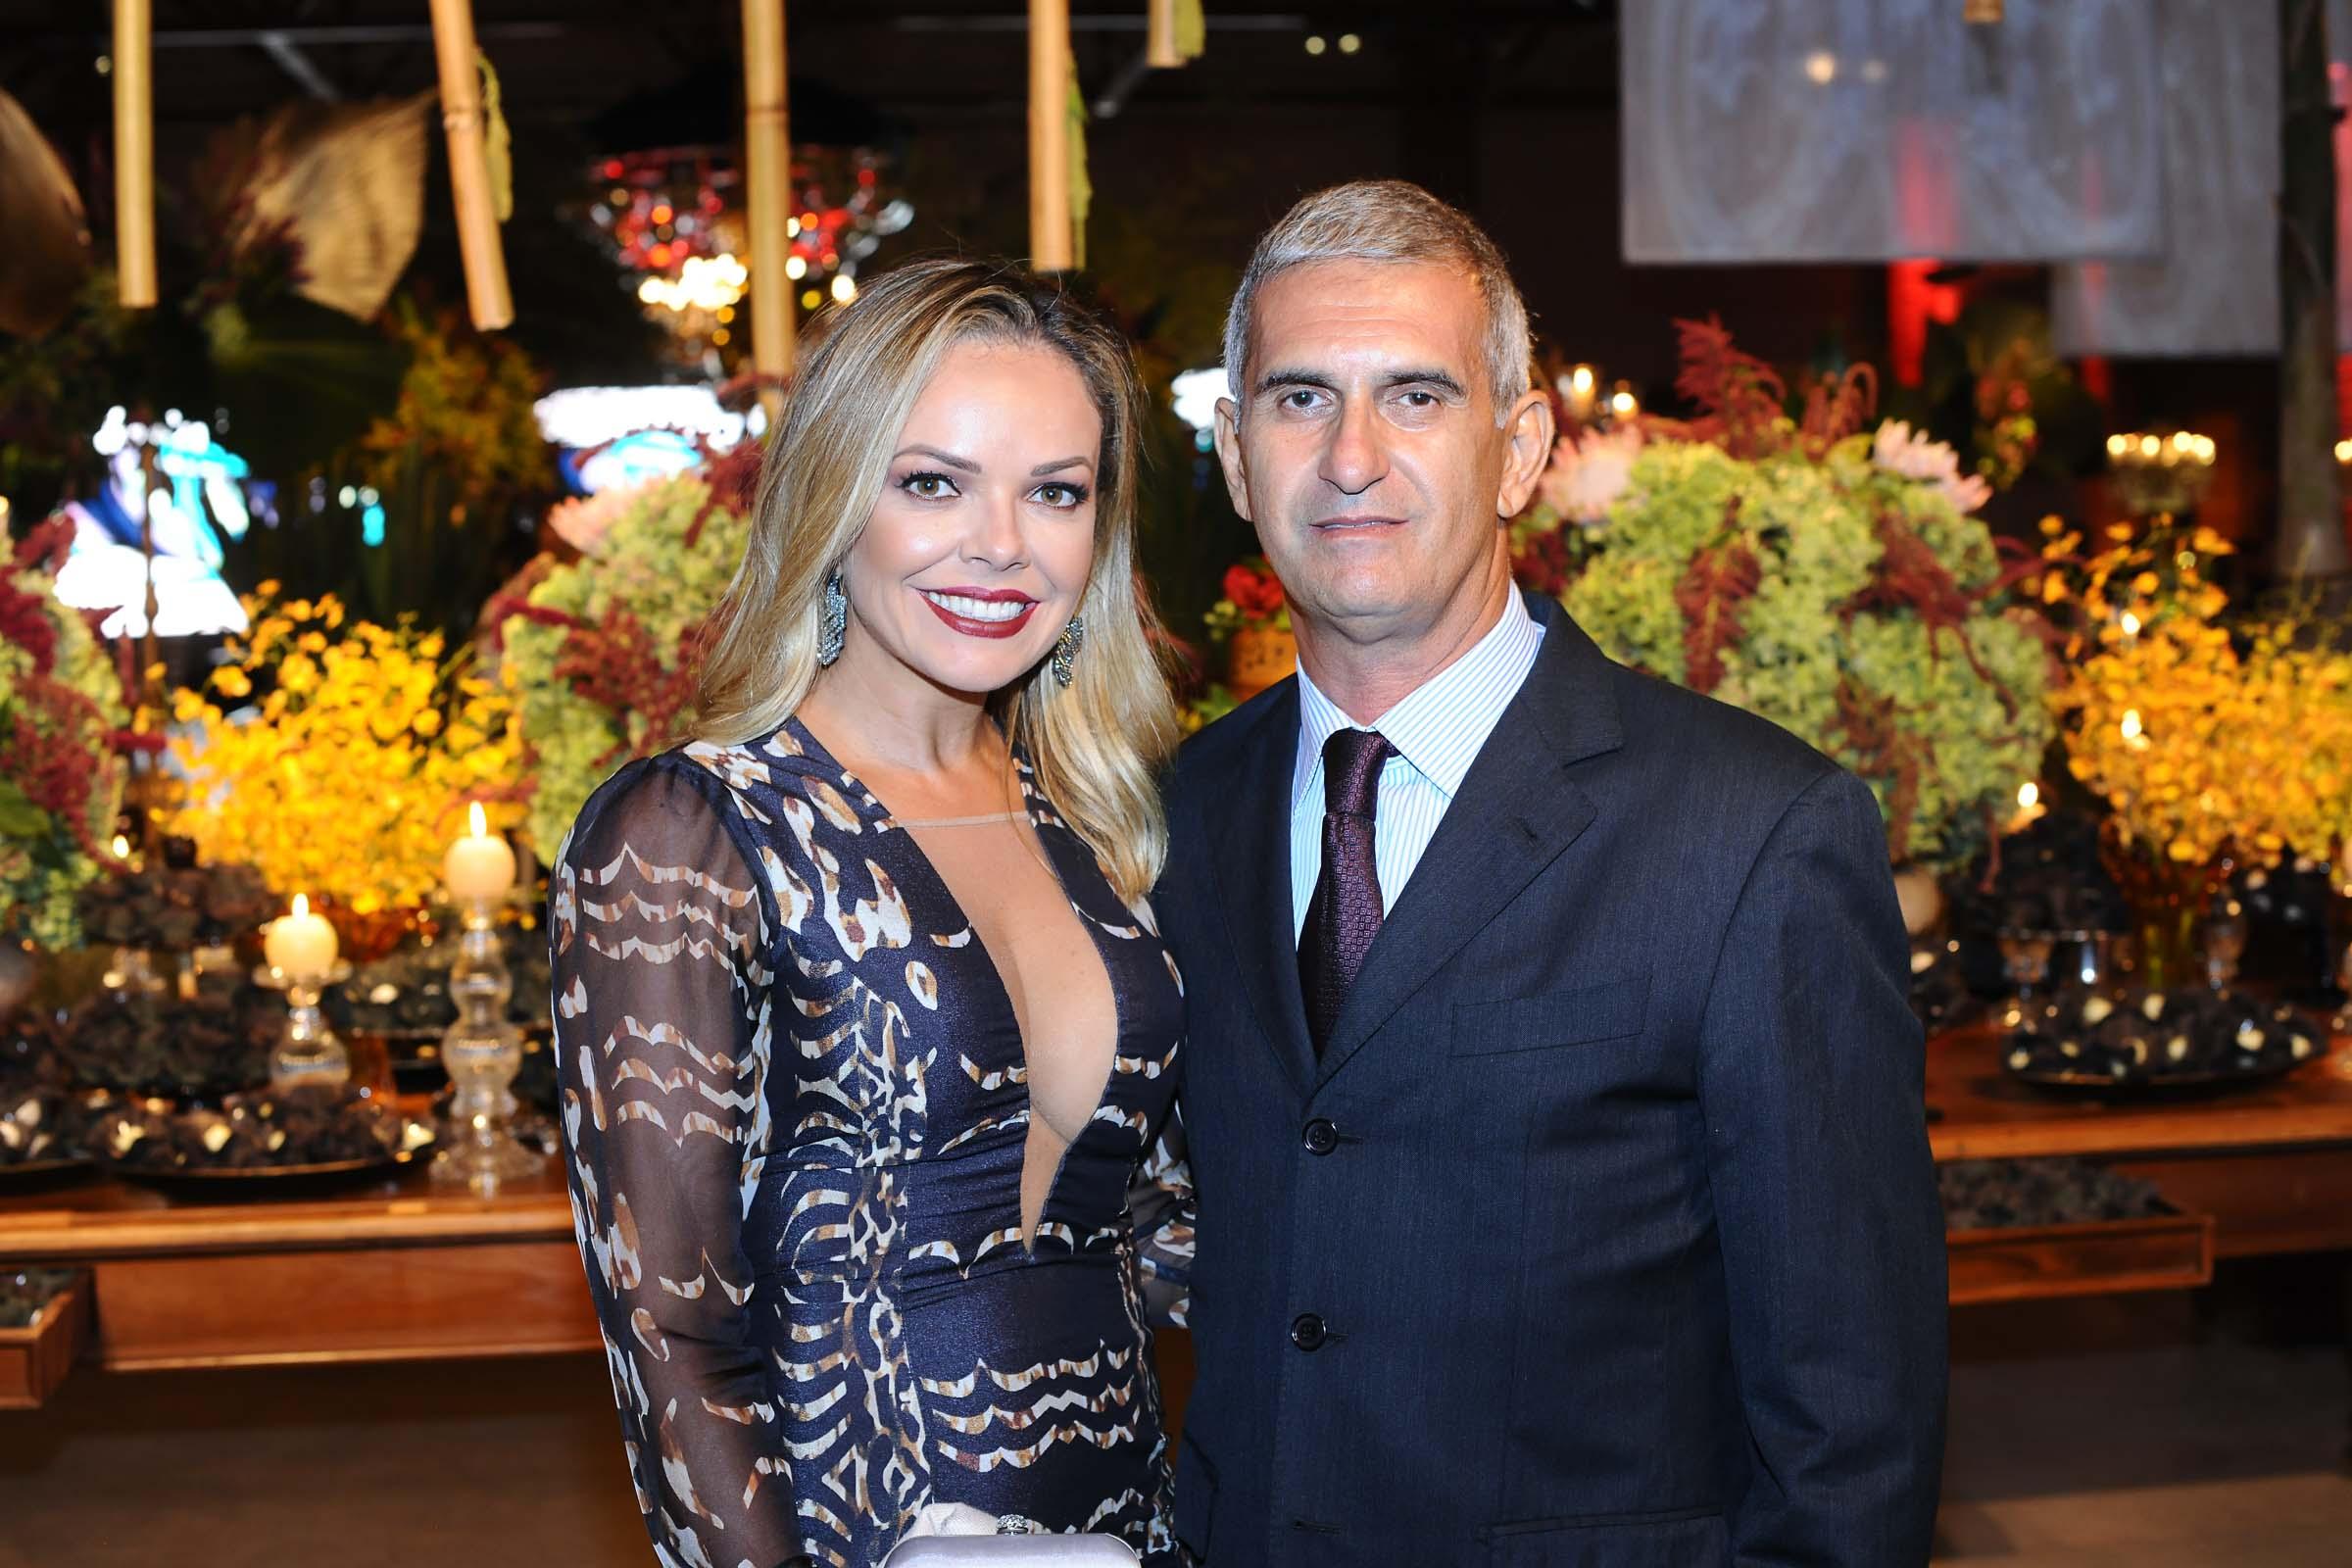 O casal Silvana e Flávio Buainain, presenças queridas nos eventos sociais